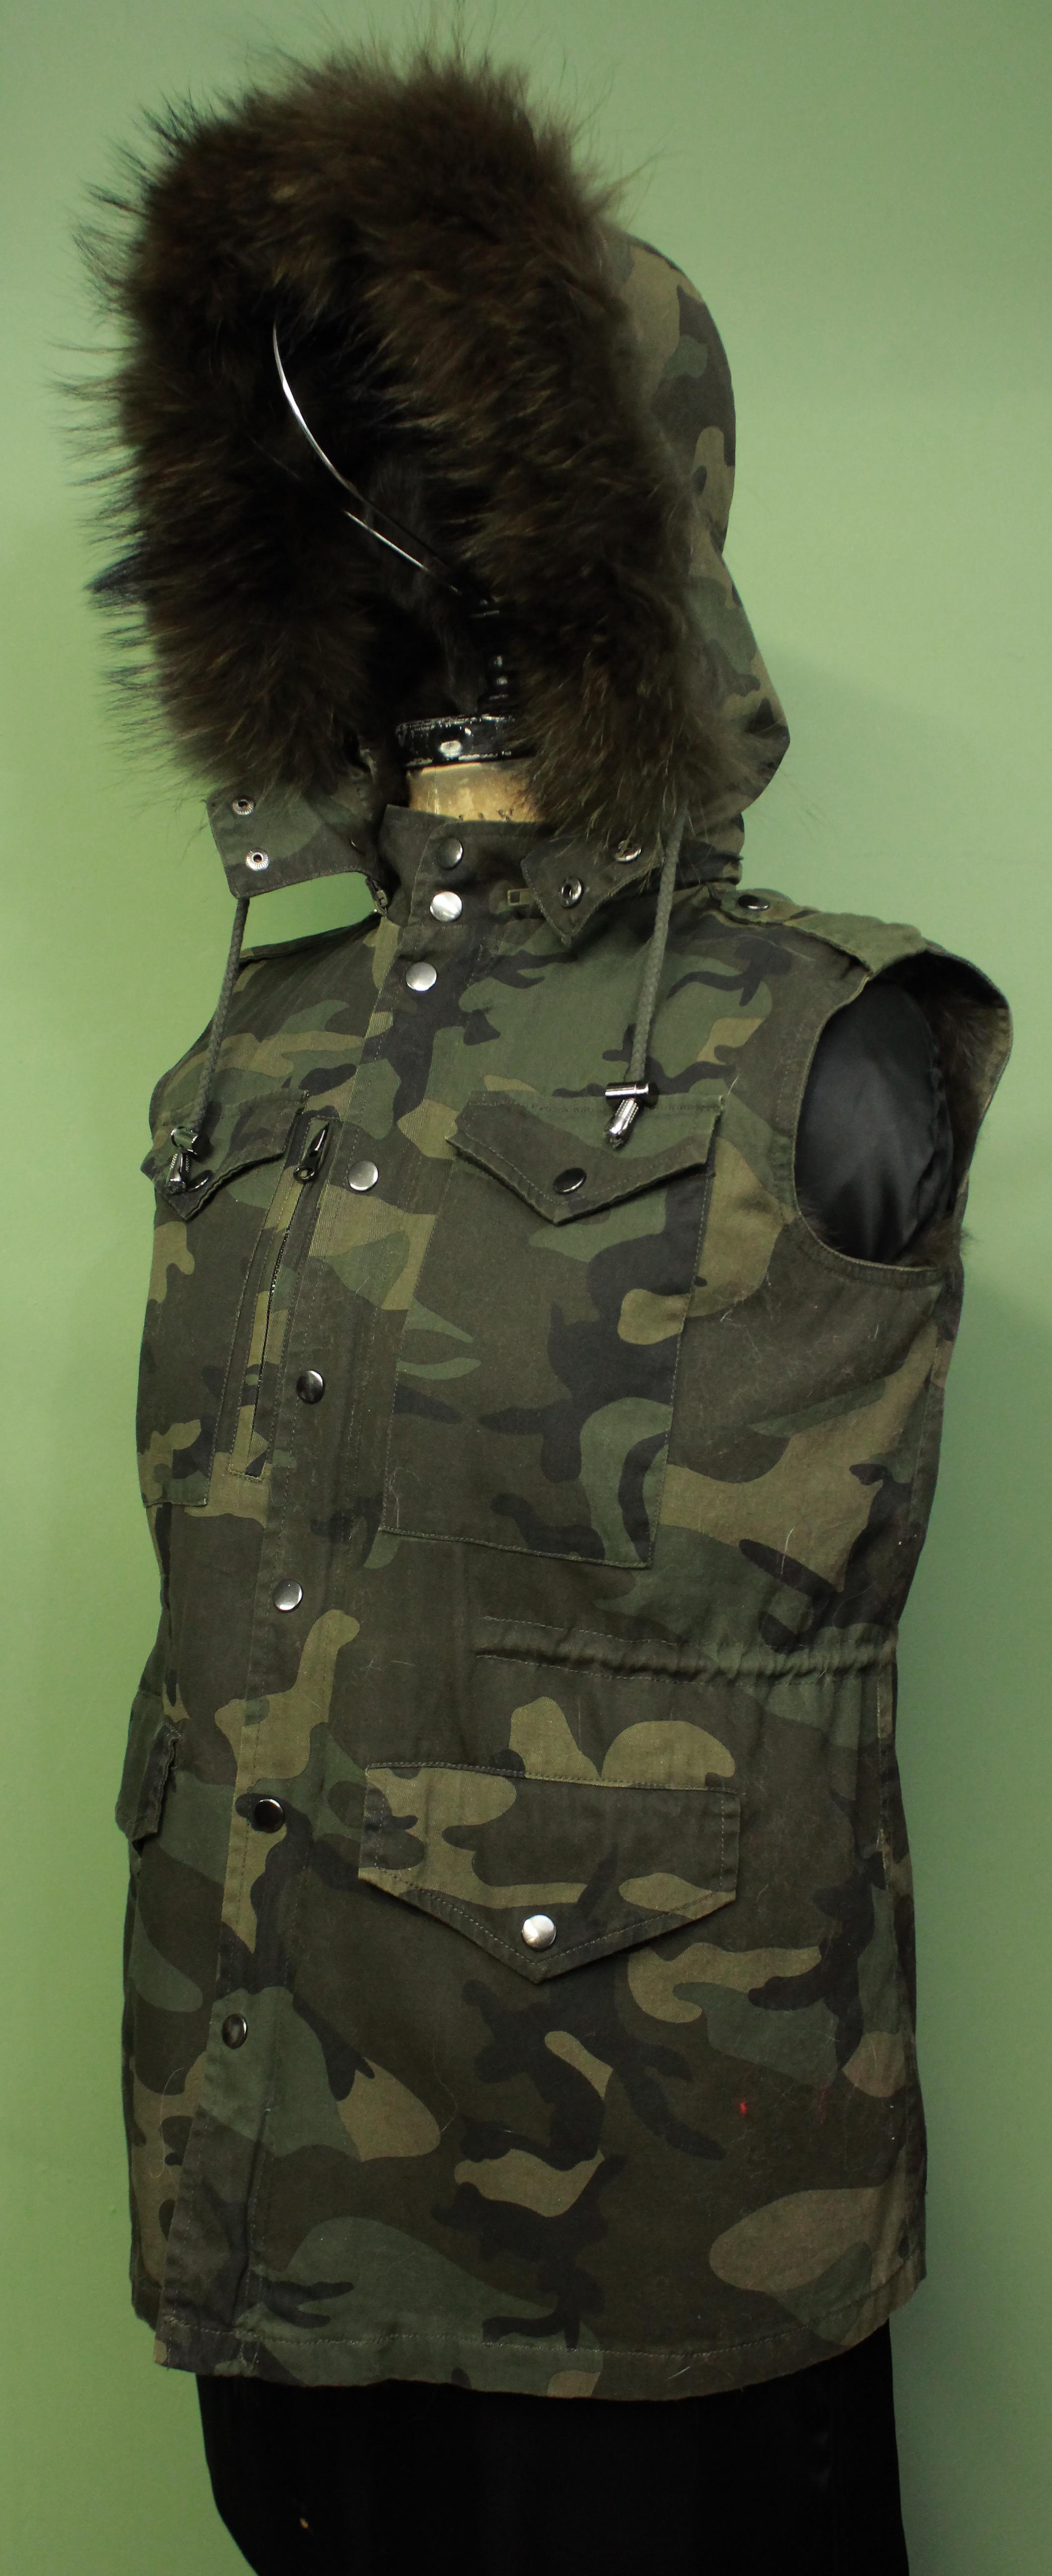 Light Green Camouflage Vest Detachable Rabbit Fur Lining Detachable Hood